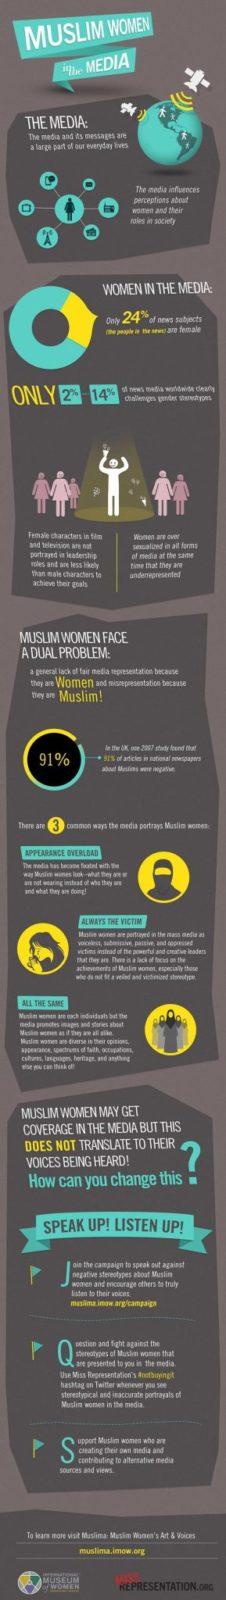 Muslim-women-in-the-Media